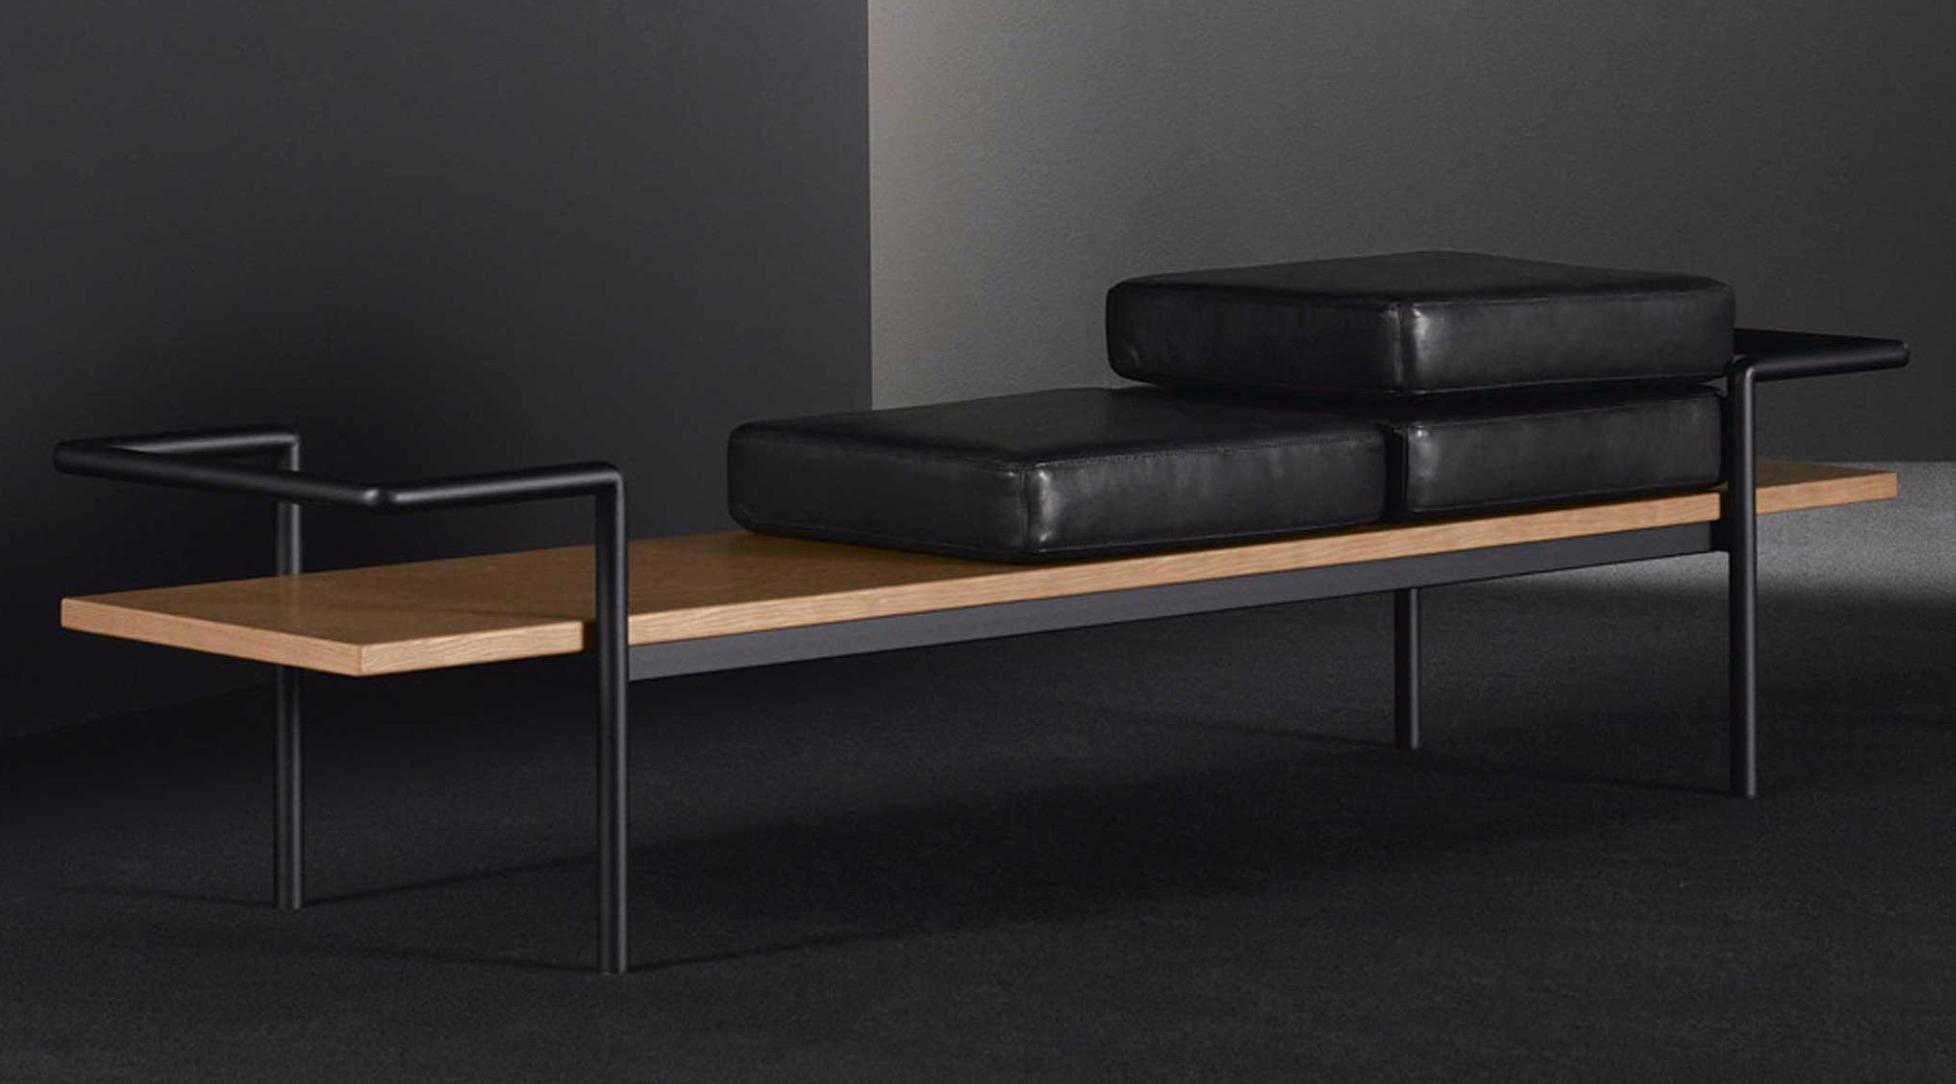 sitzkissen f r bank t904 von poltrona frau. Black Bedroom Furniture Sets. Home Design Ideas